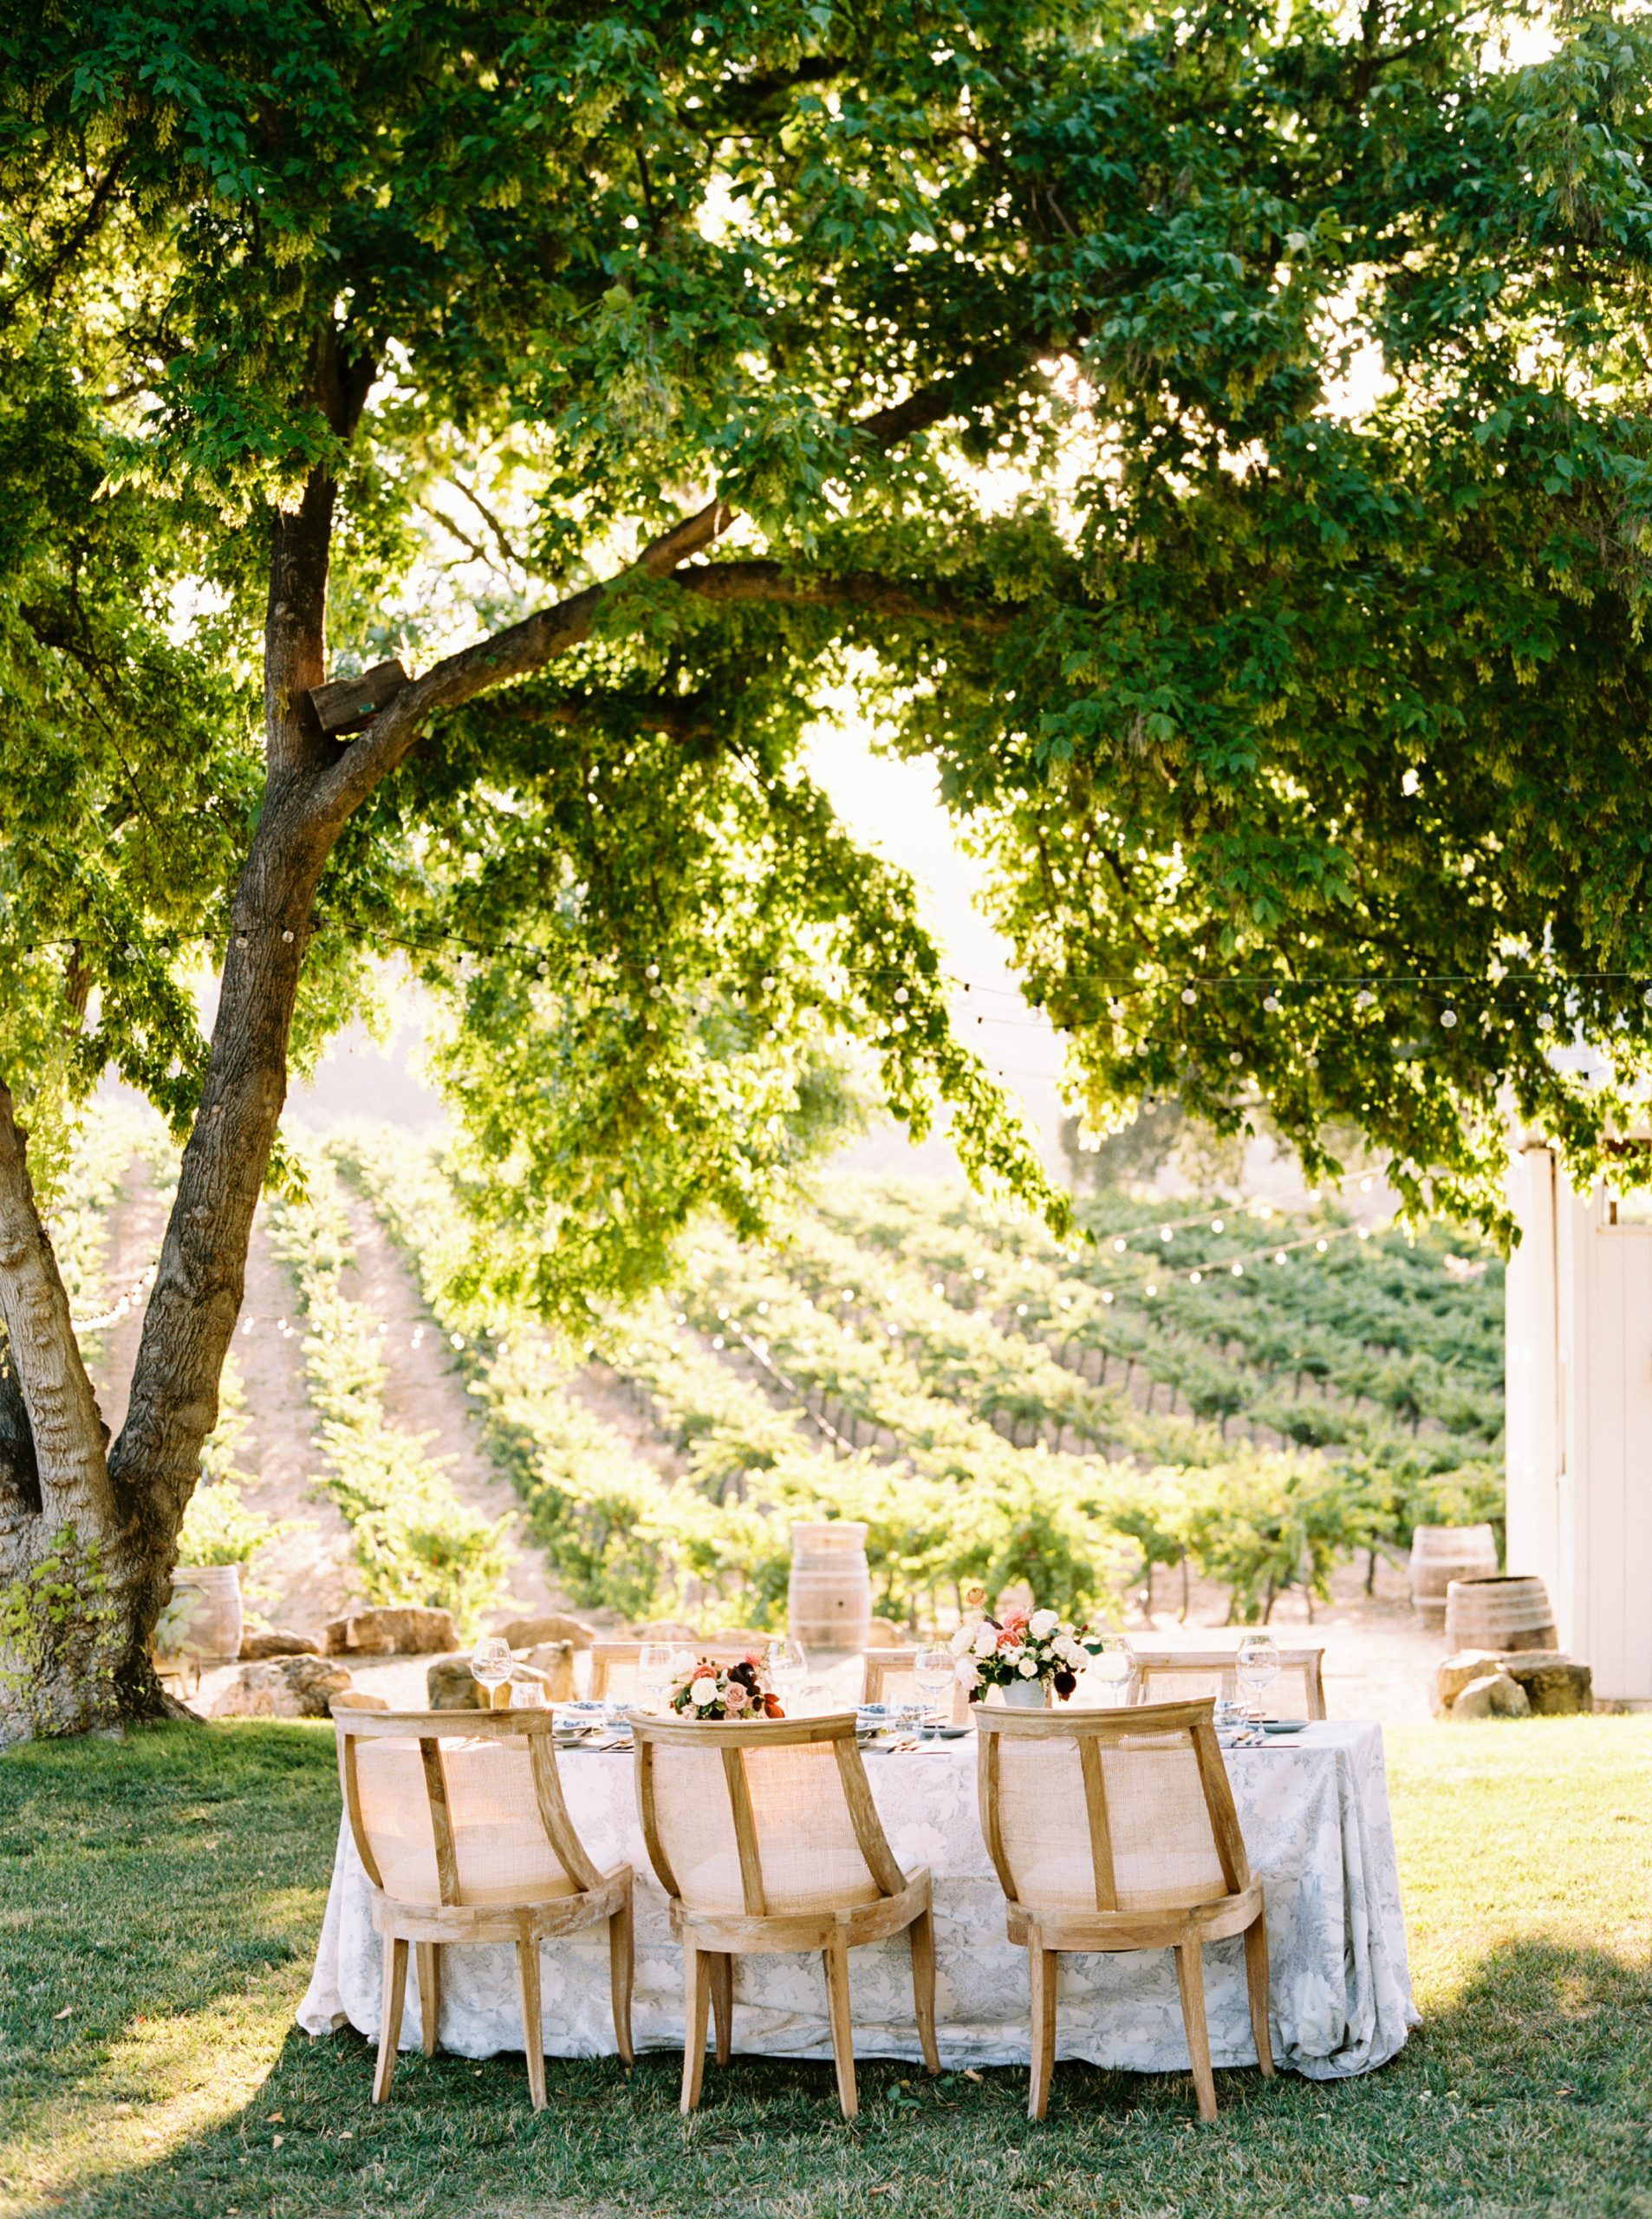 HammerSky Wedding Inspiration Featured on Hey Wedding Lady with Vanessa Noel Events - Ashley Baumgartner - SLO Wedding Photographer_0002